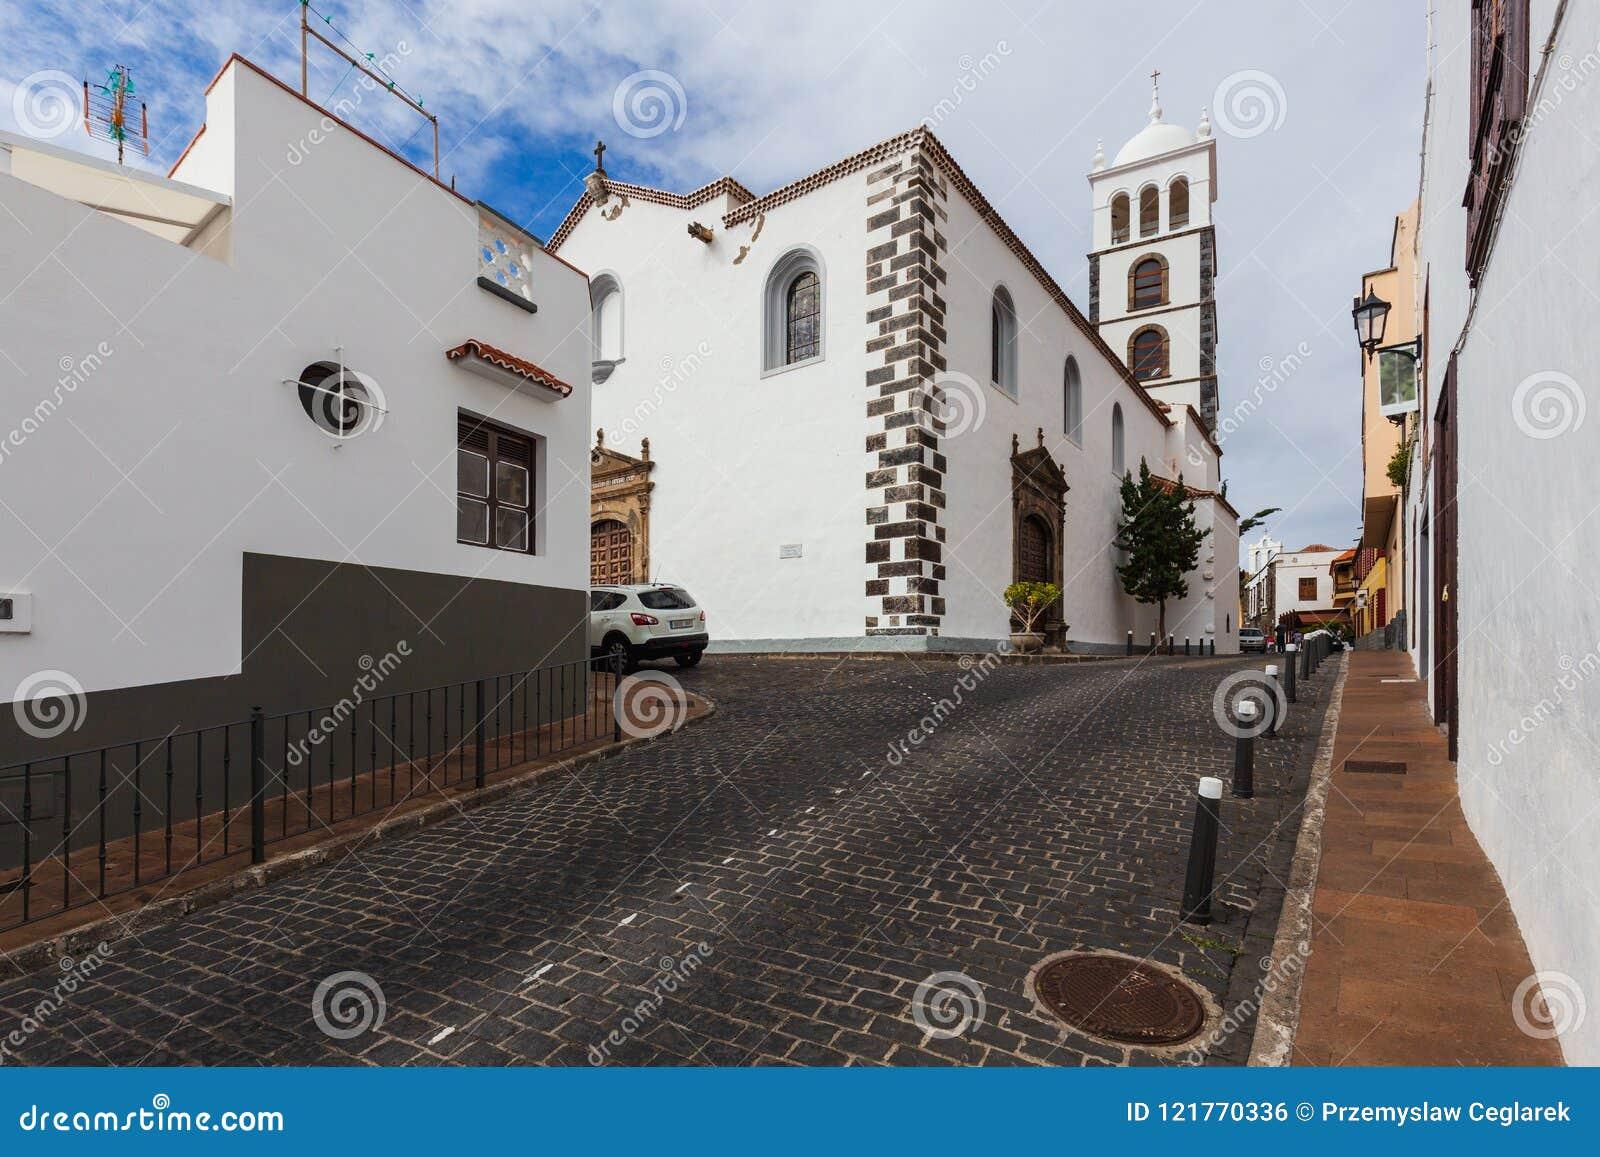 The architecture of Garachico village on Tenerife